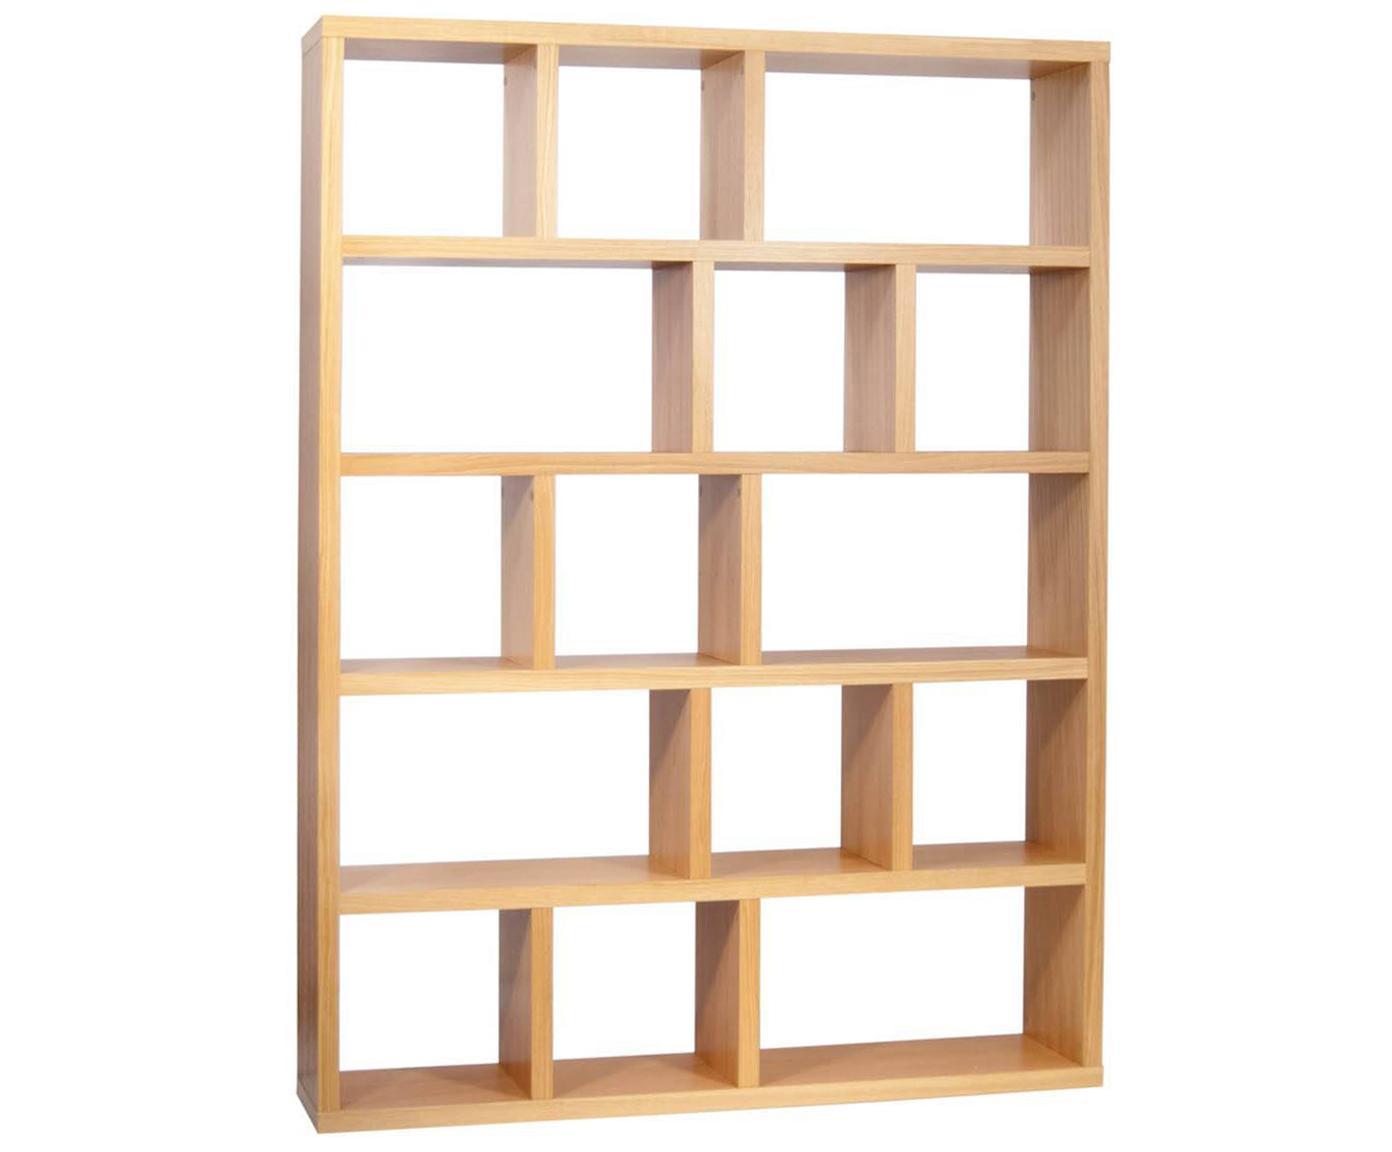 Wandkast Portlyn, Frame: houtvezelplaat, spaanplaa, Eikenhoutkleurig, bruin, 150 x 198 cm